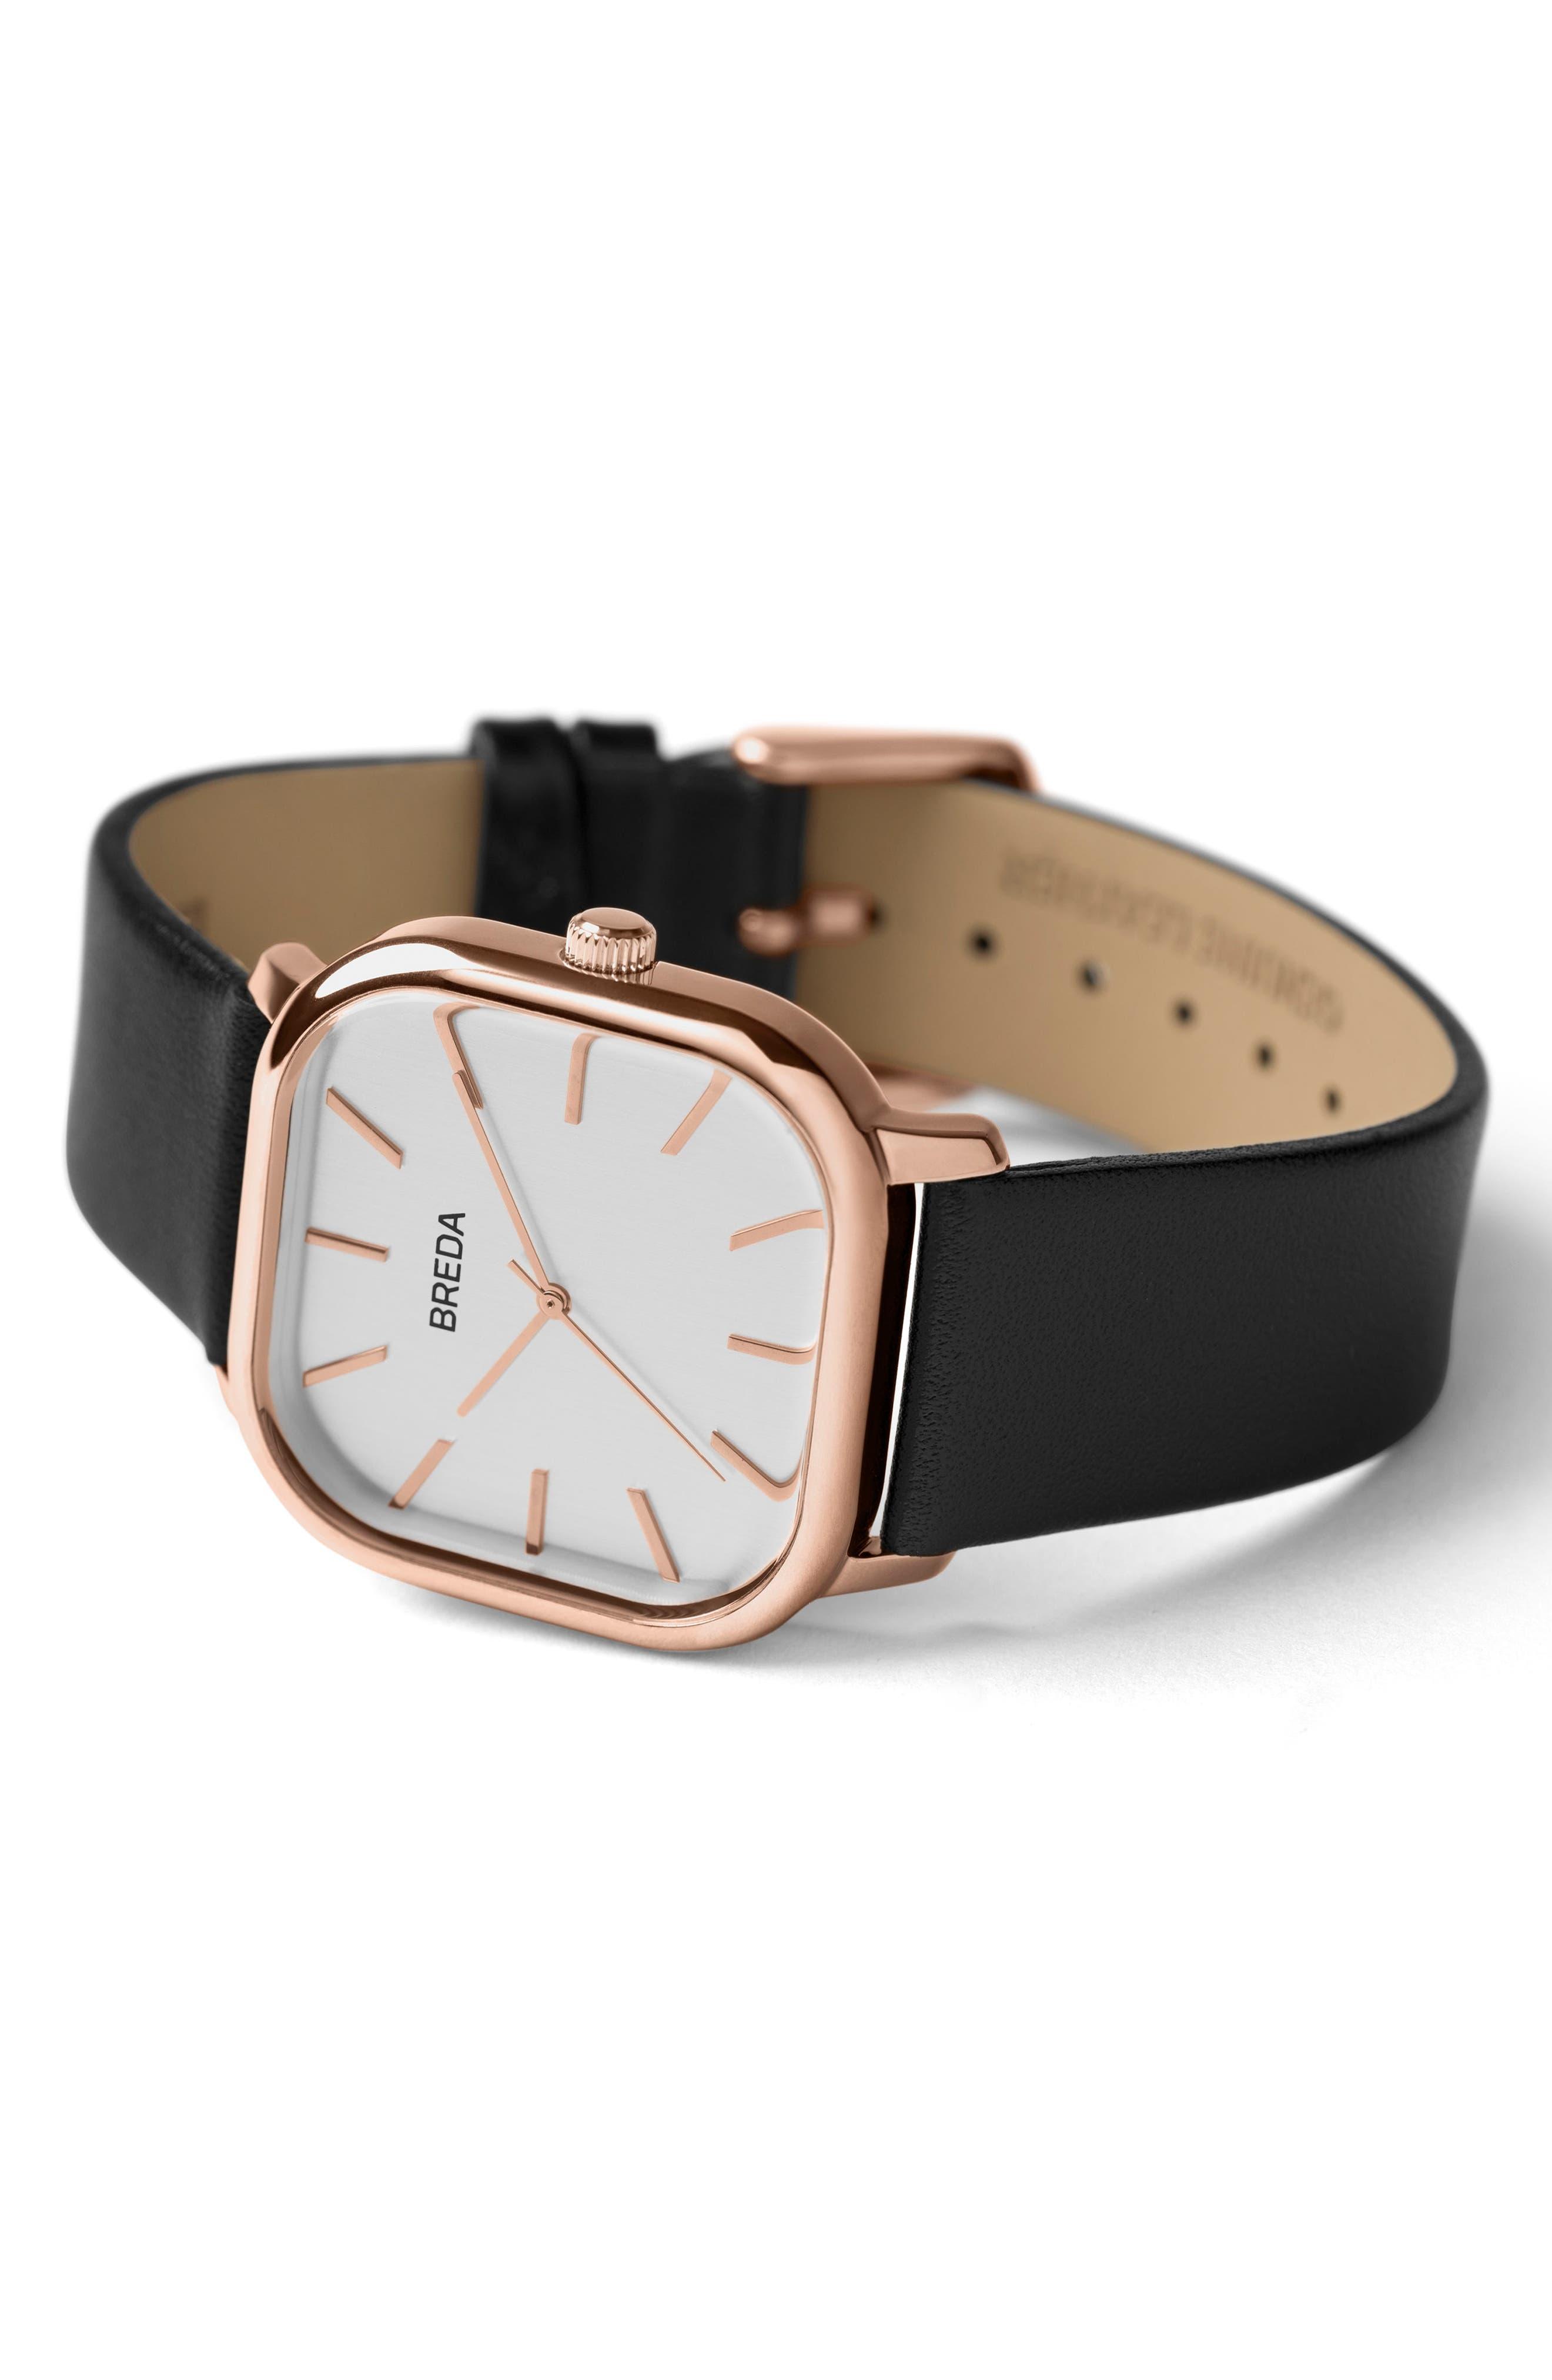 Visser Square Leather Strap Watch, 35mm,                             Alternate thumbnail 2, color,                             001